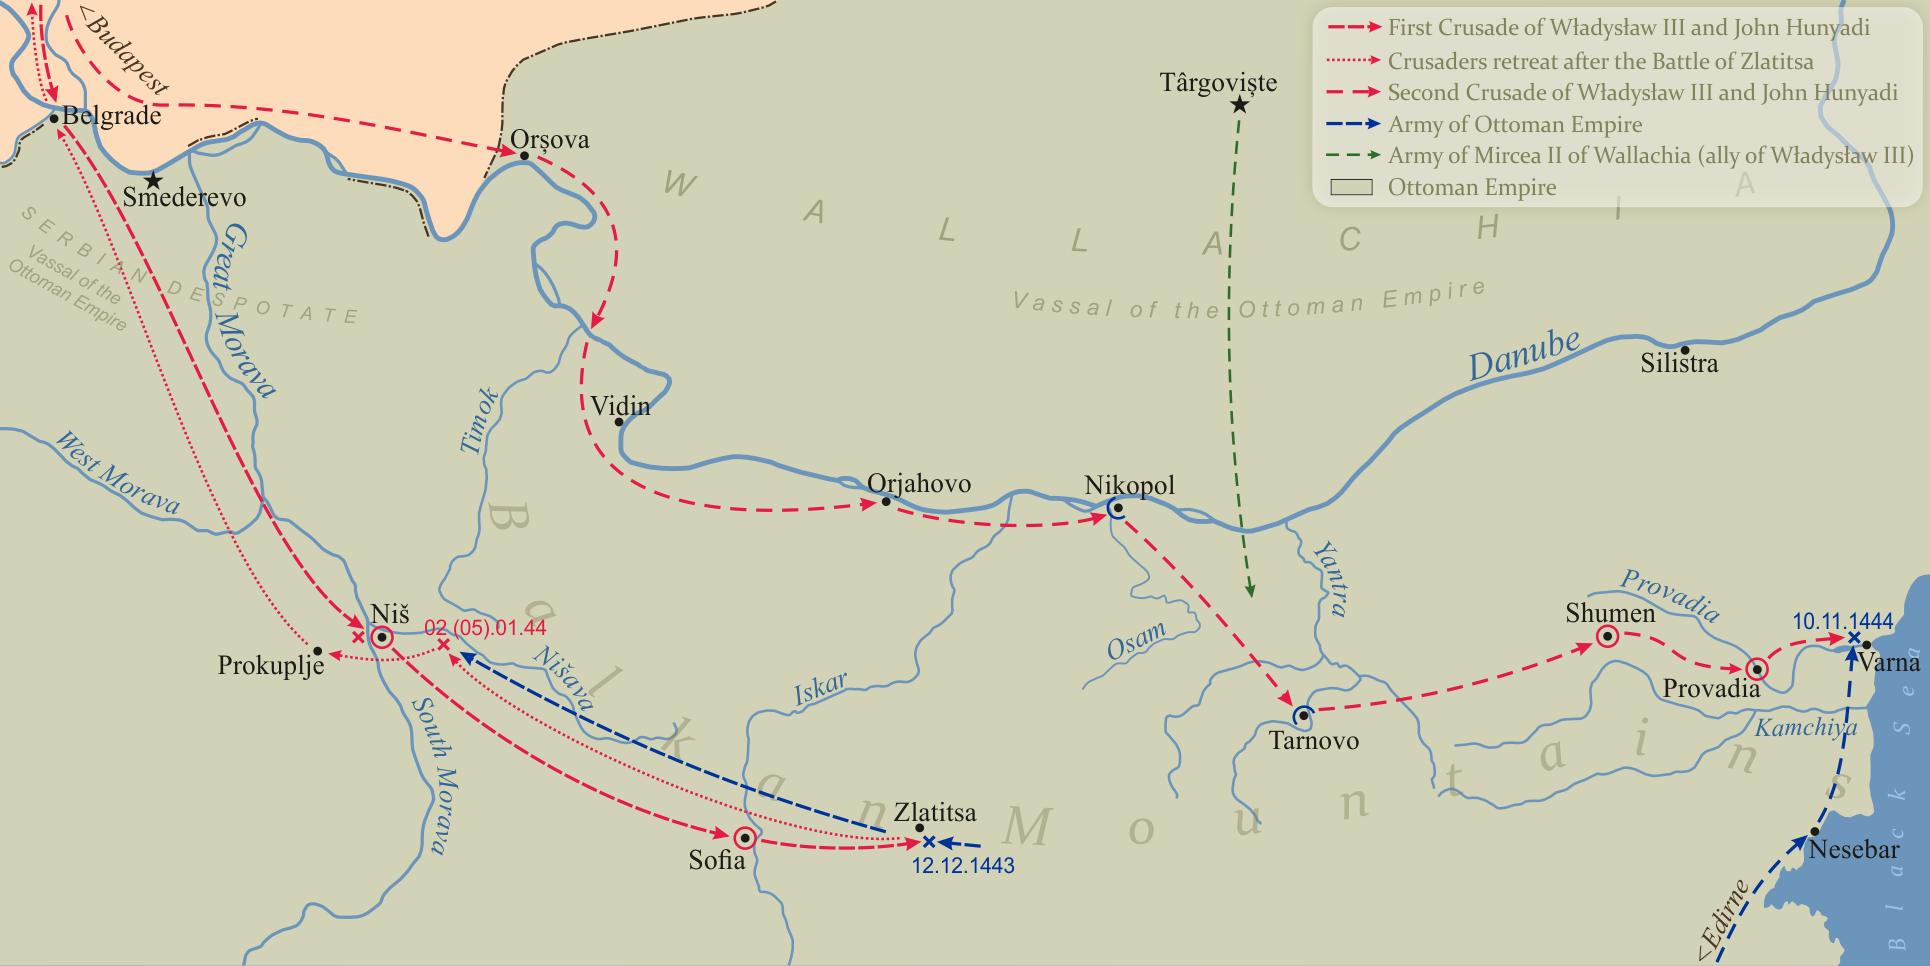 FileCrusade Of Varna Mappng Wikimedia Commons - Varna map